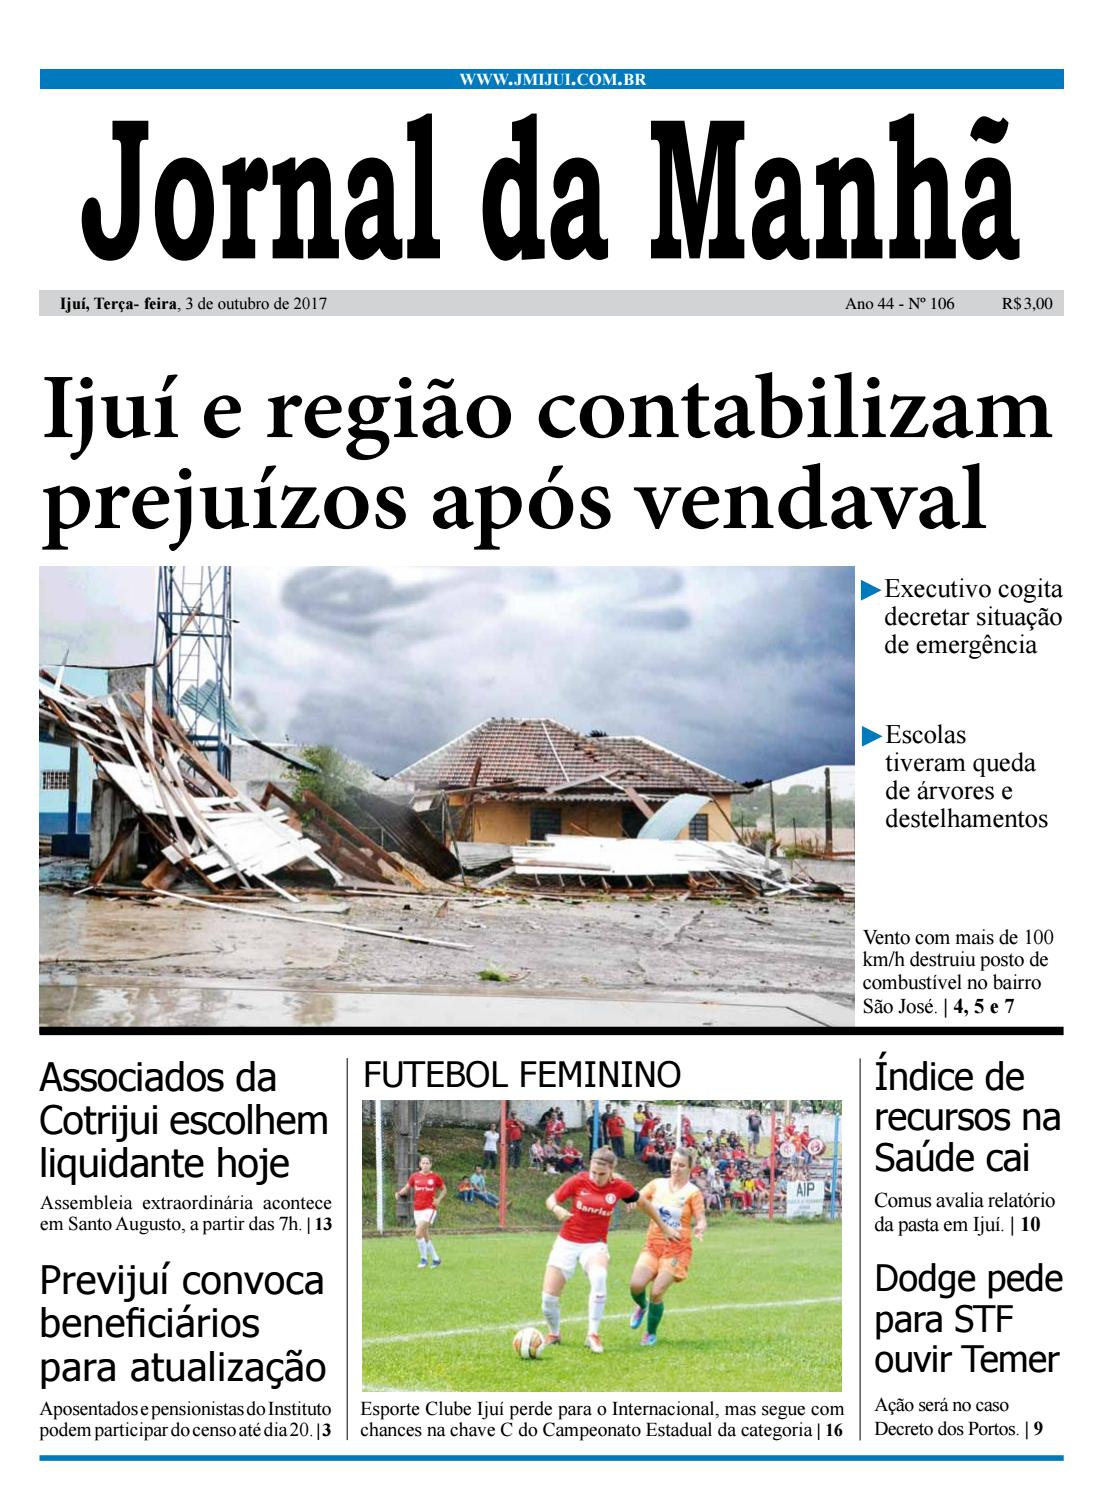 63529874659 Jornal da Manhã - Terça-feira - 03-10-17 by clicjm - issuu